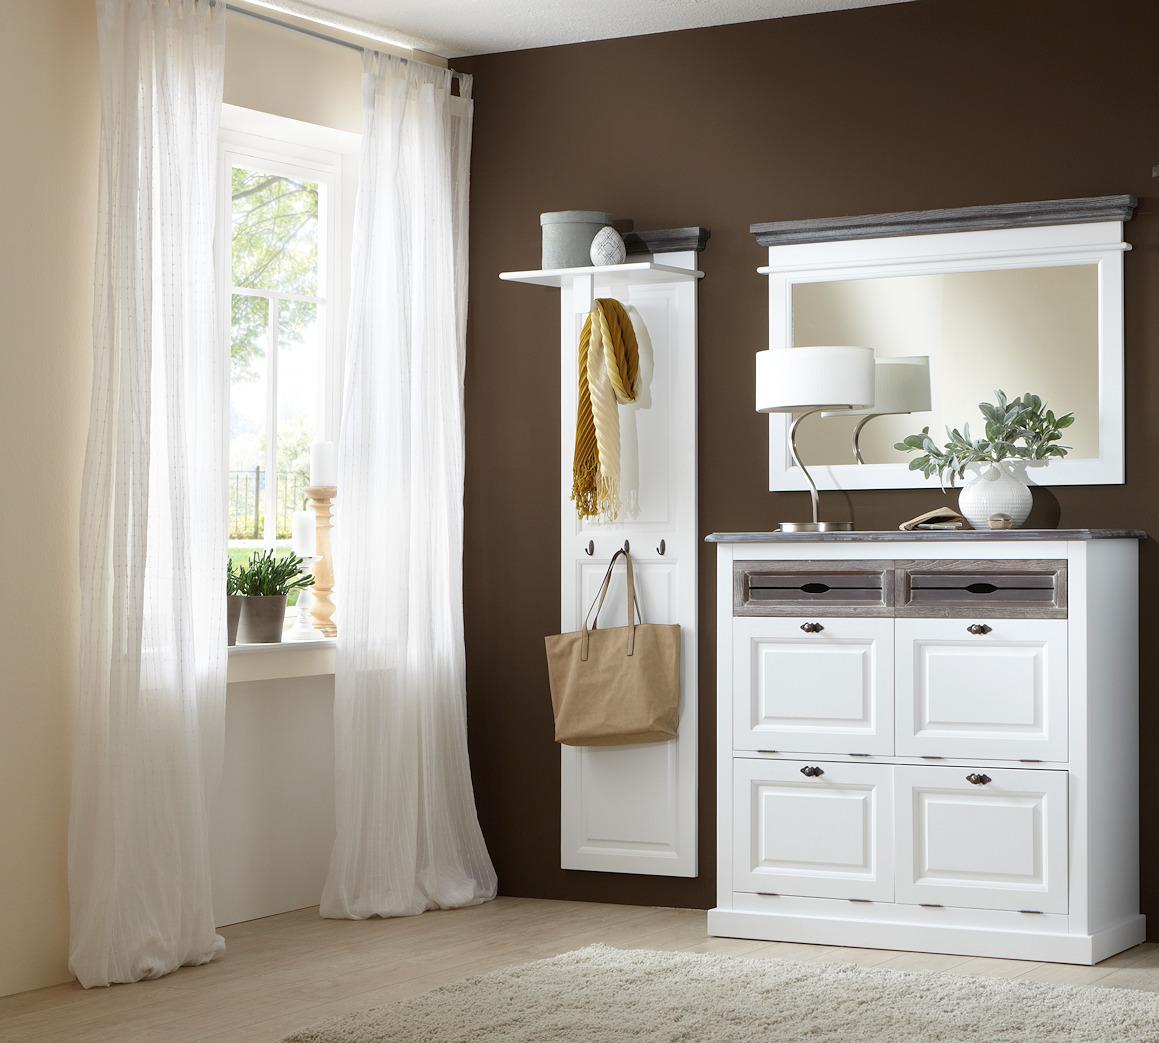 garderobe garderobenset cabana 2 im vintage look teilmassivmoebel dich. Black Bedroom Furniture Sets. Home Design Ideas